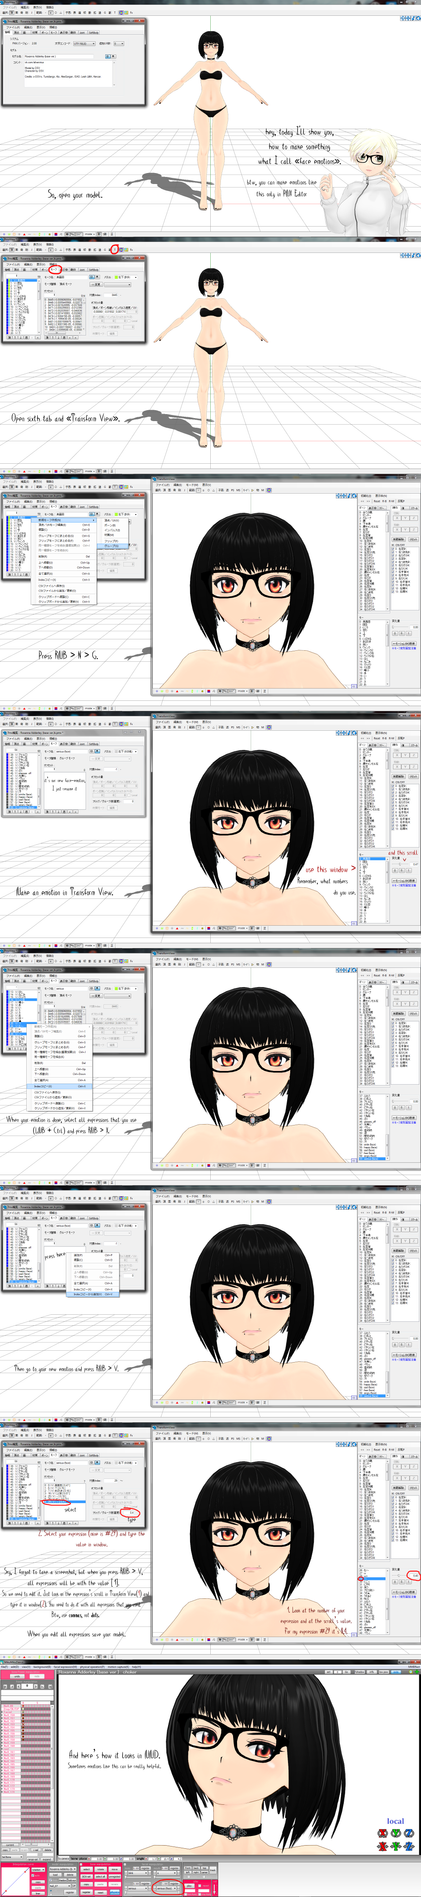 [MMD Tutorial] Making a Face-Emotion ~ by o-DSV-o